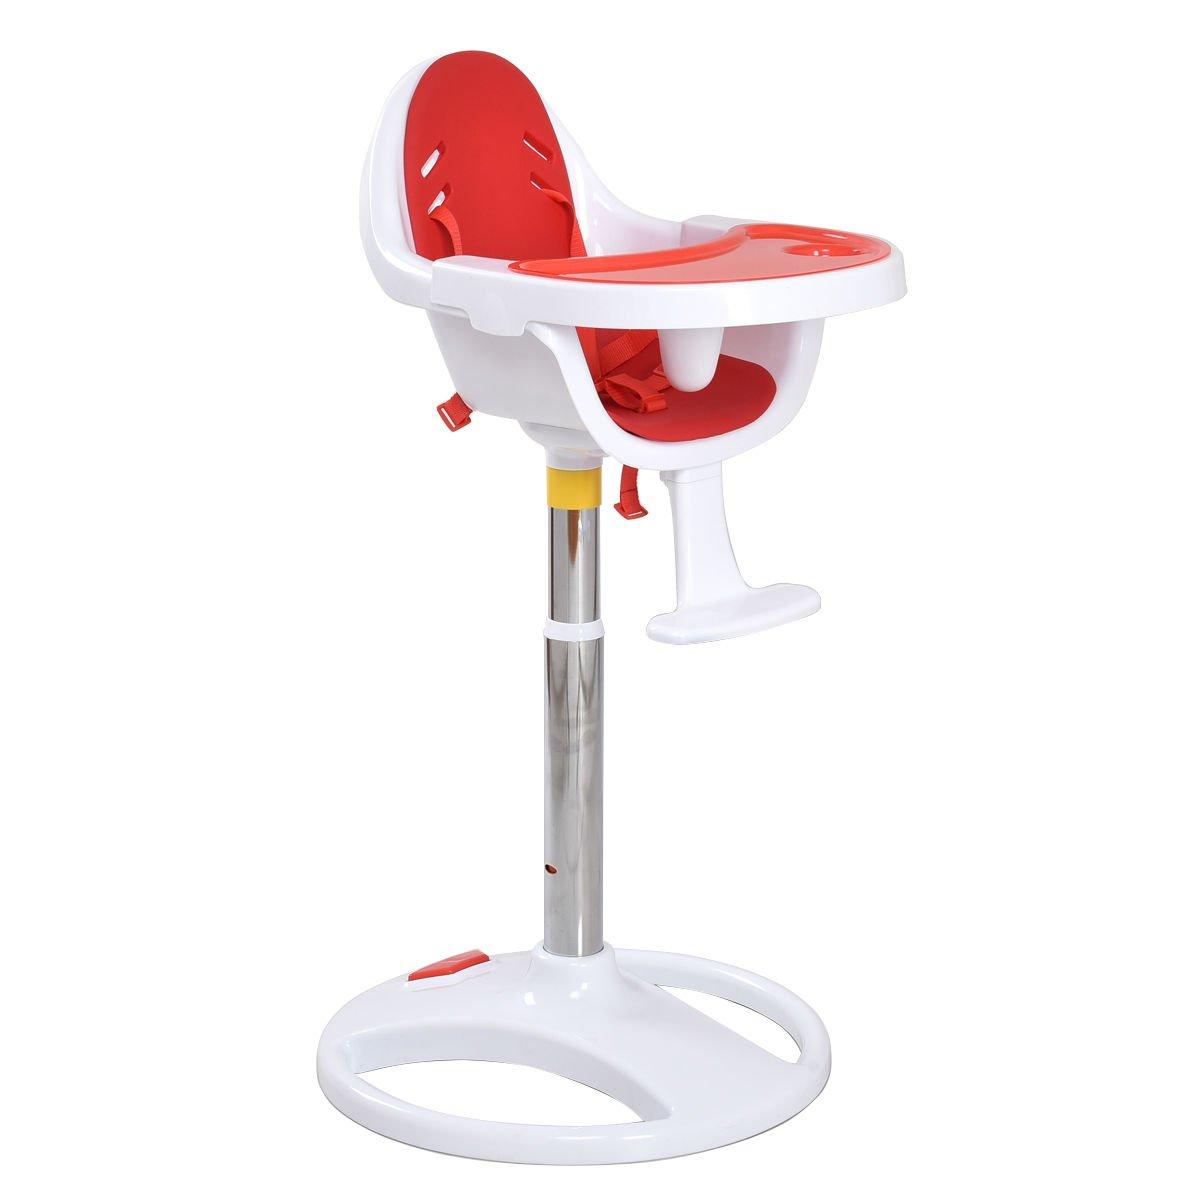 Costzon Baby High Chair Pedestal Adjustable Highchair Safety Seat (Red)